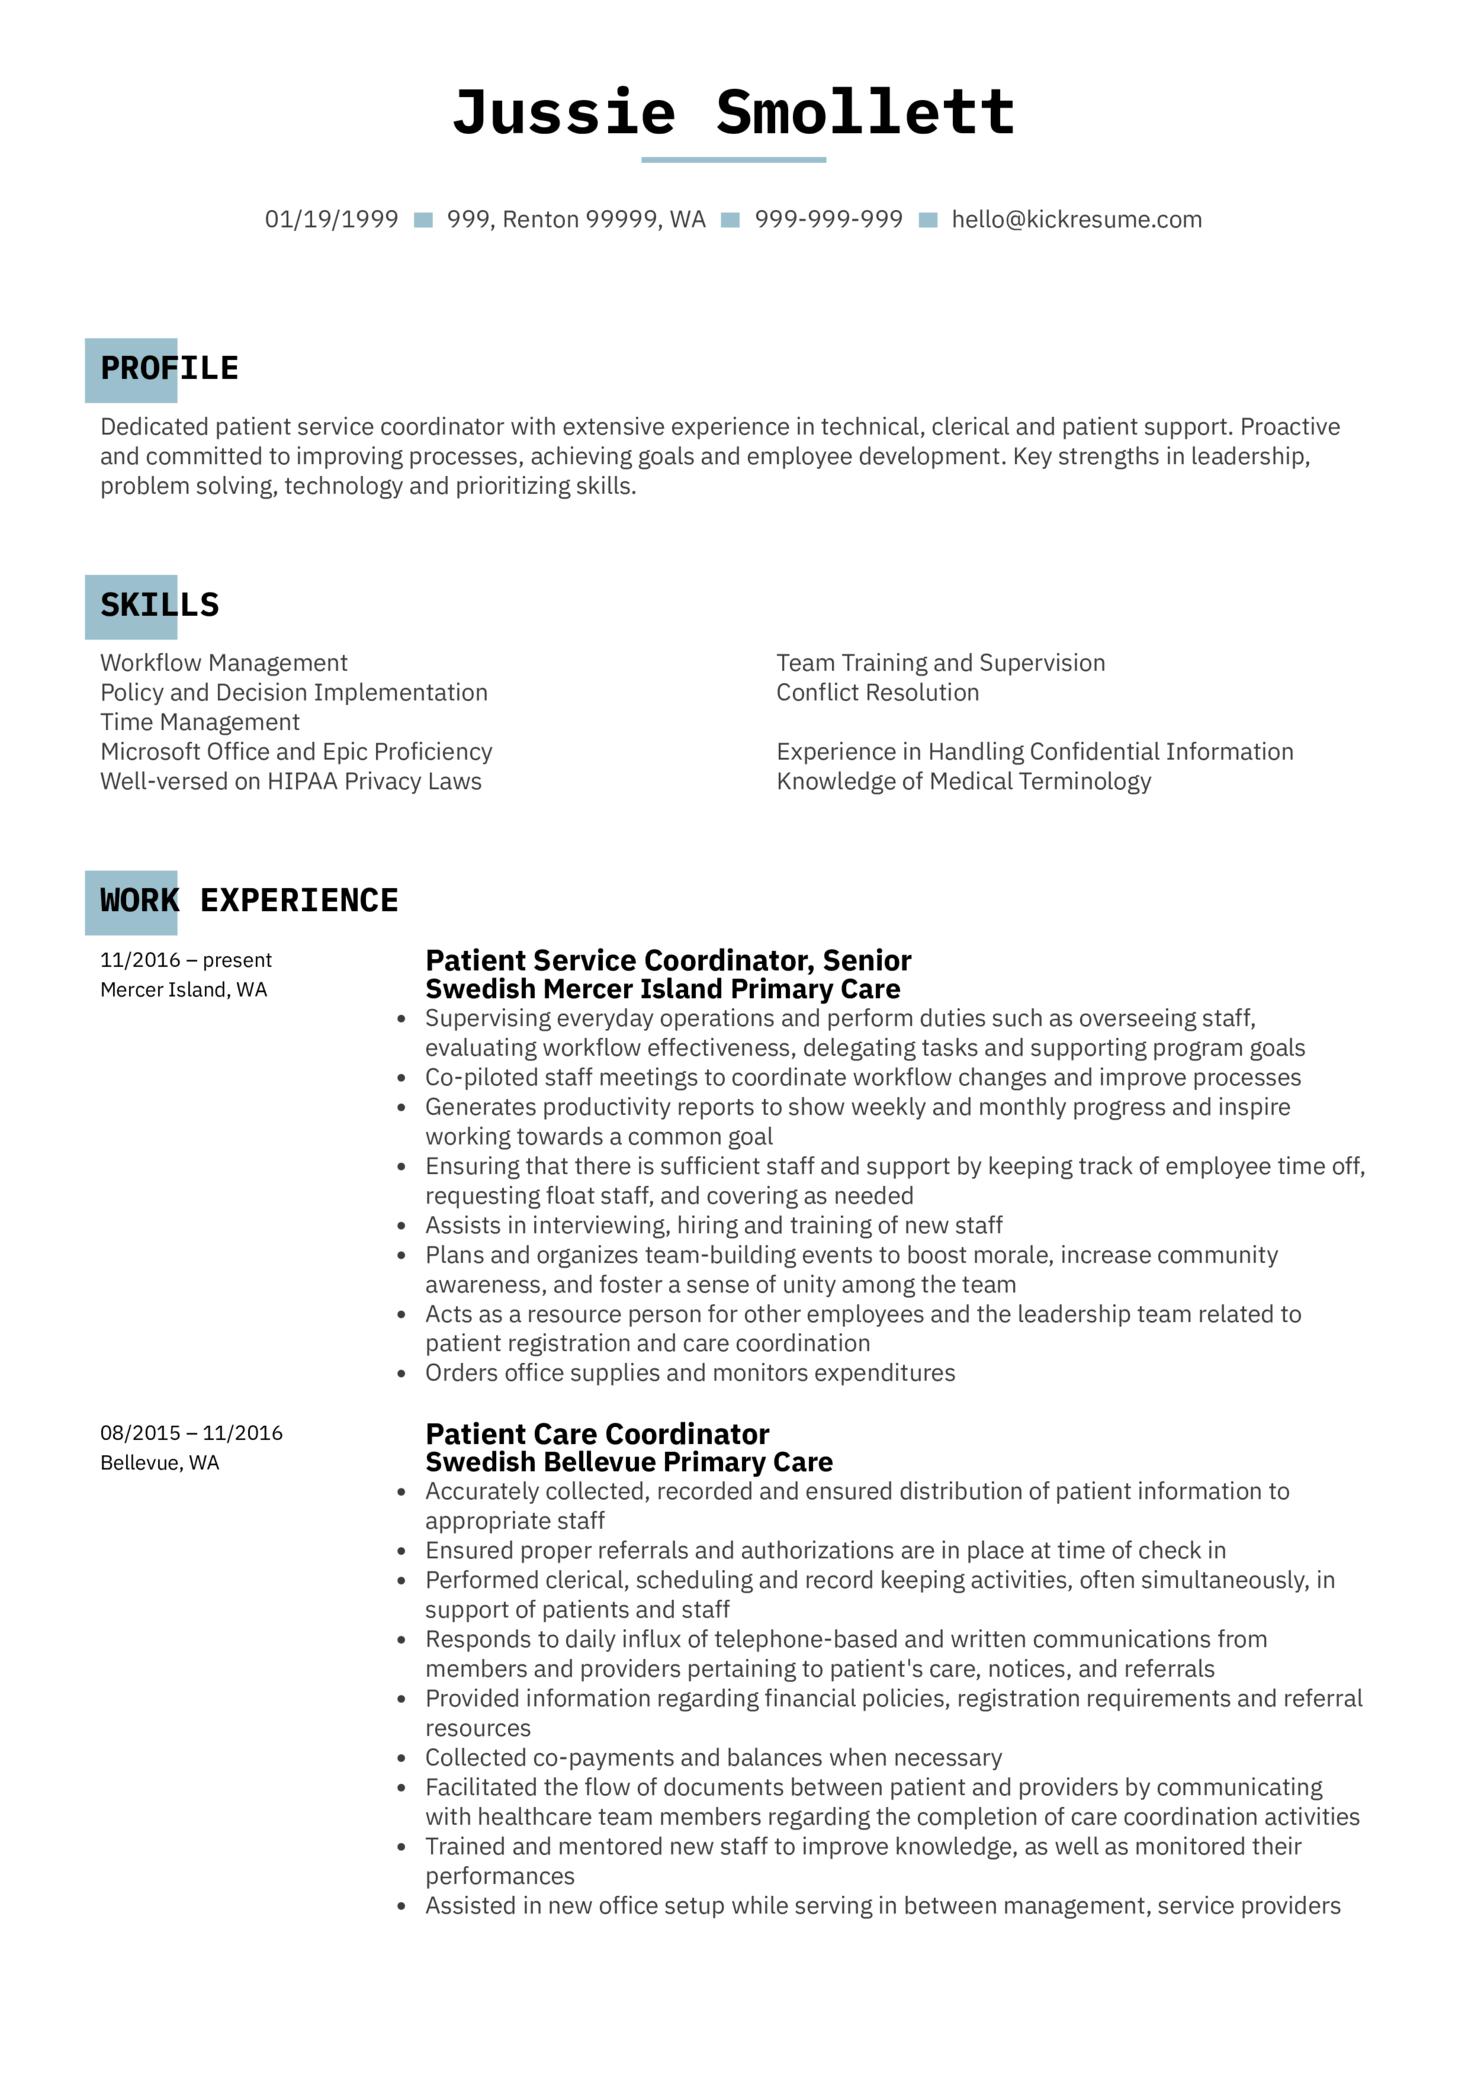 Patient Service Coordinator Resume Sample (Part 1)